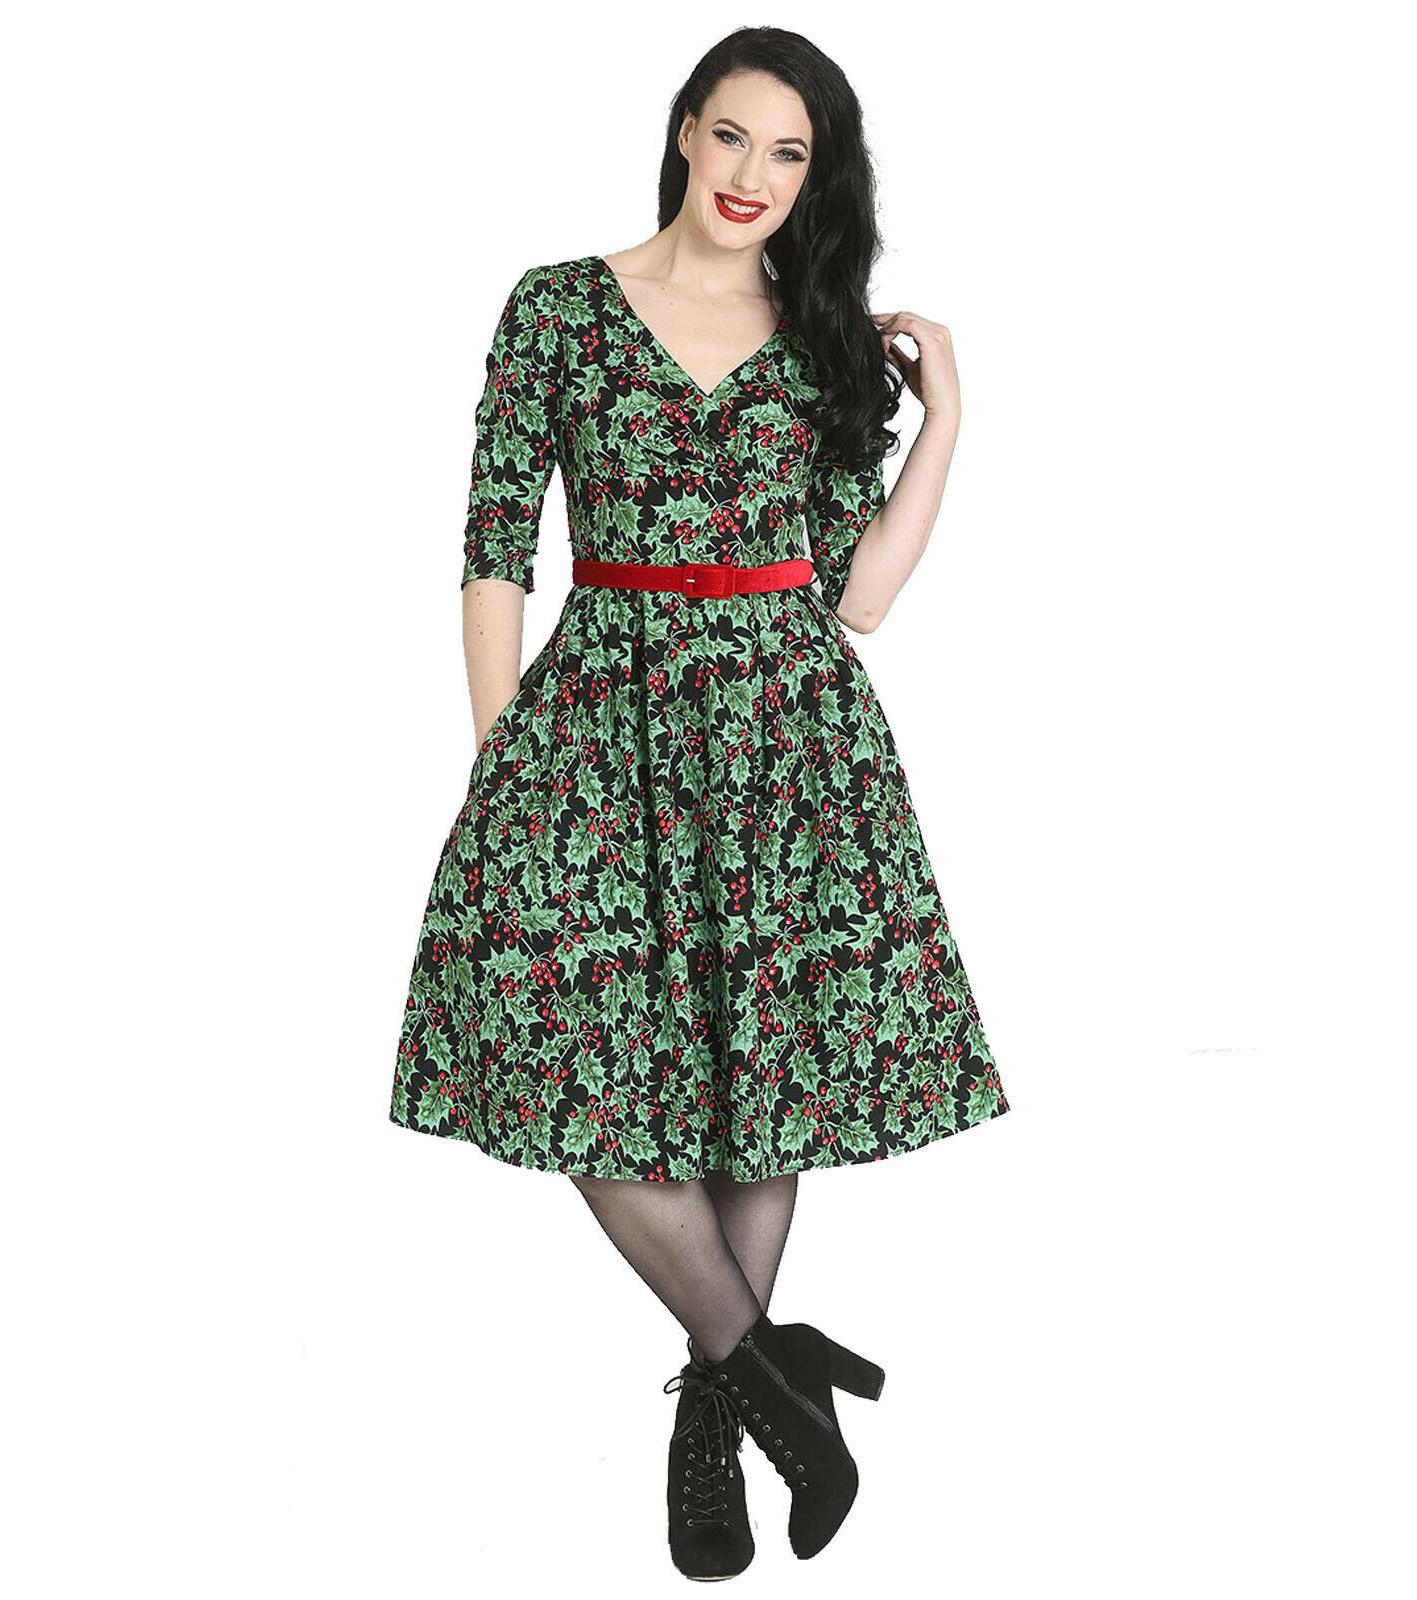 Hell-Bunny-50s-Pin-Up-Navidad-Vestido-Festivo-Rojo-Holly-Berry-Negro-Todos-los-Tamanos miniatura 11